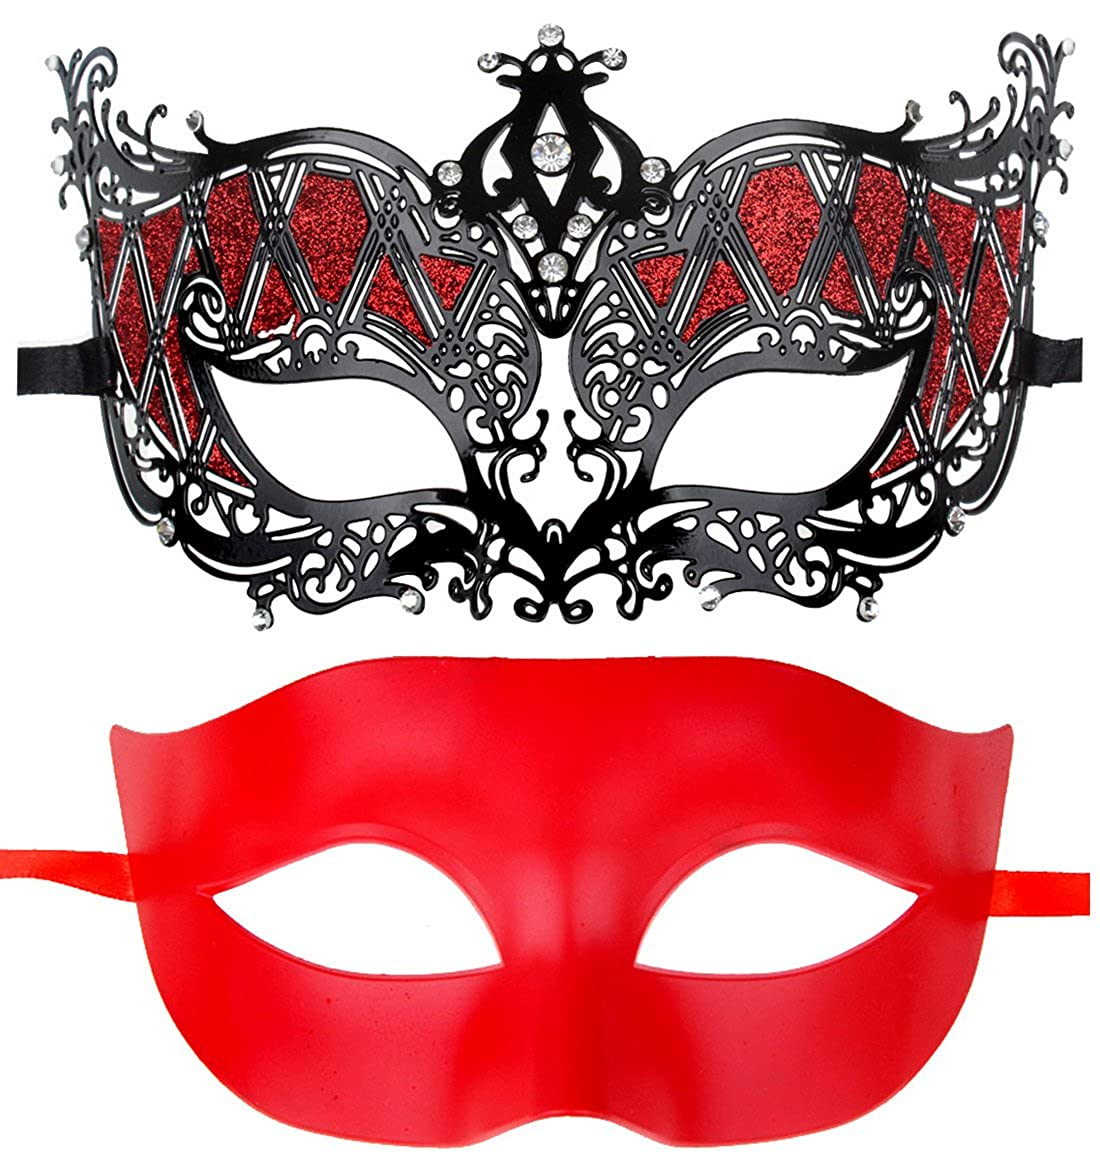 IETANG Couples Pair Half Venetian Masquerade Ball Mask Set Party Costume Accessory